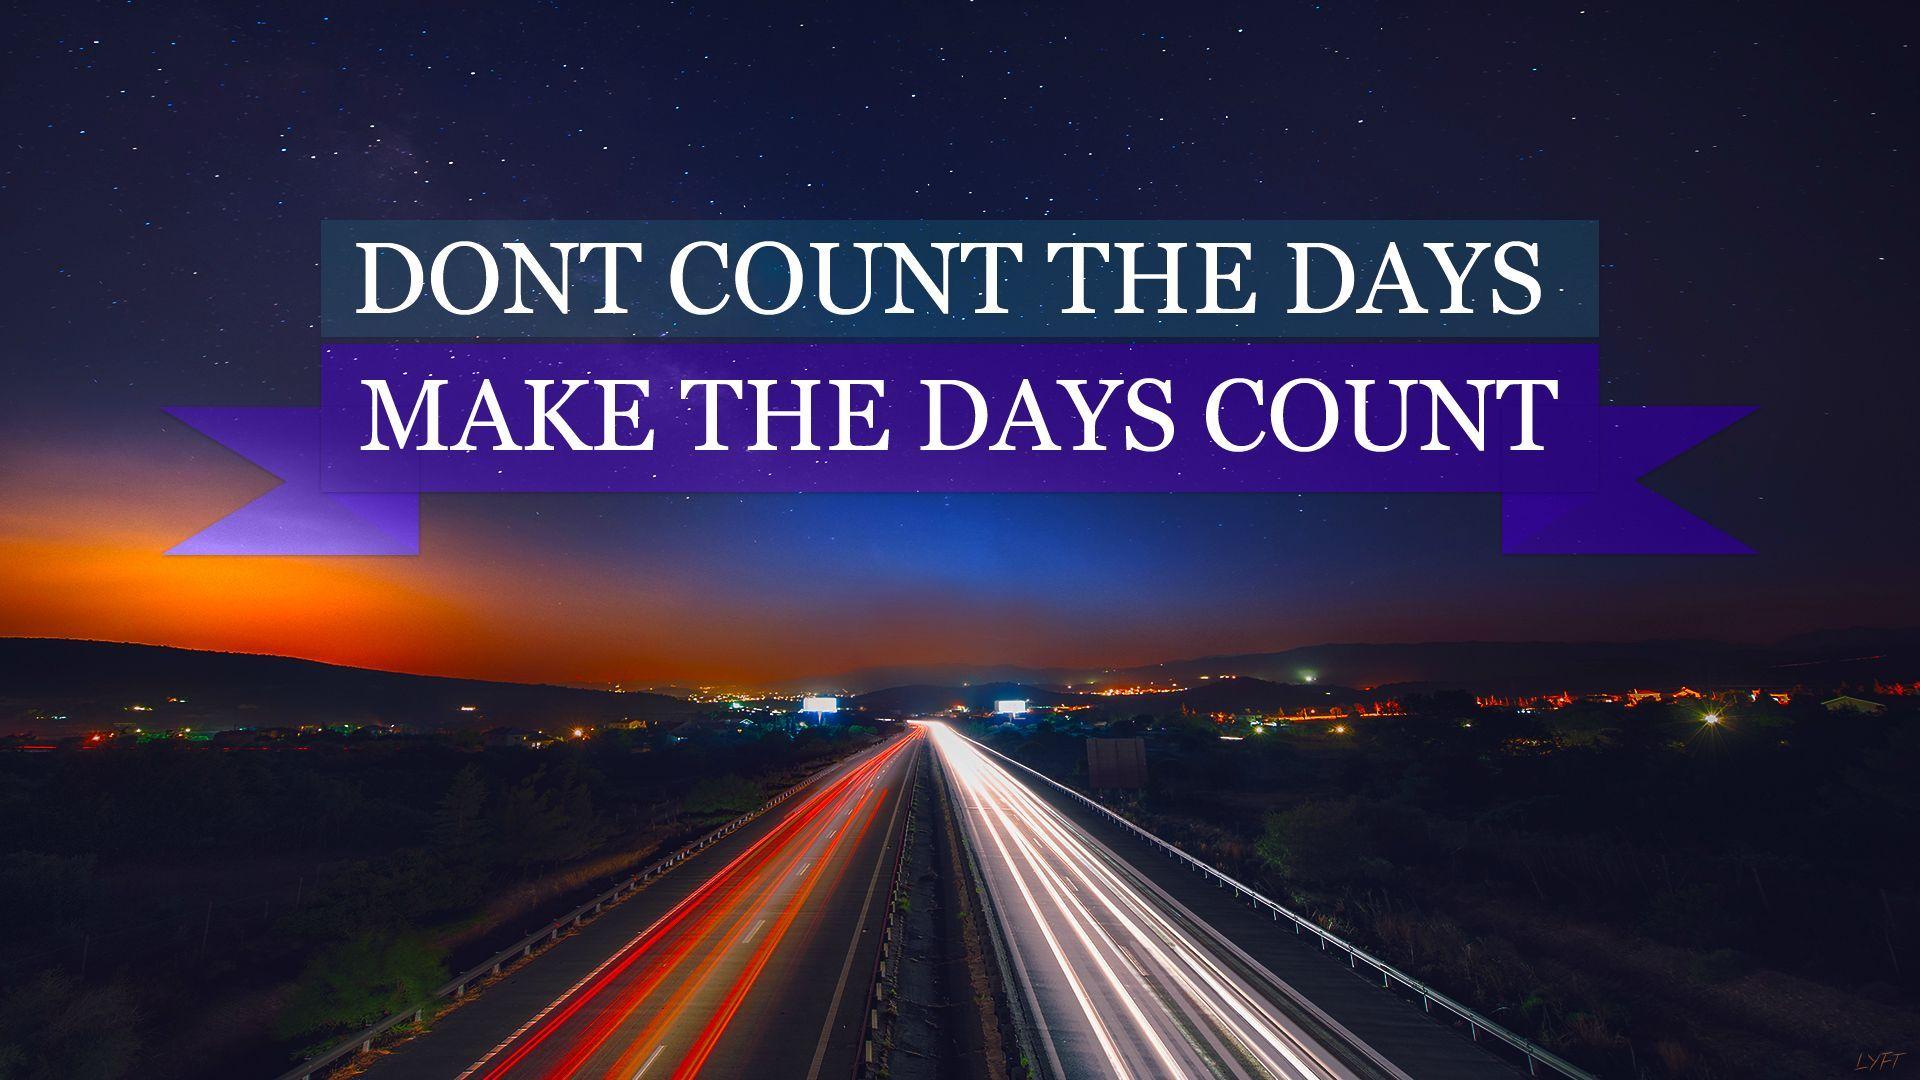 uplifting encouraging quotes